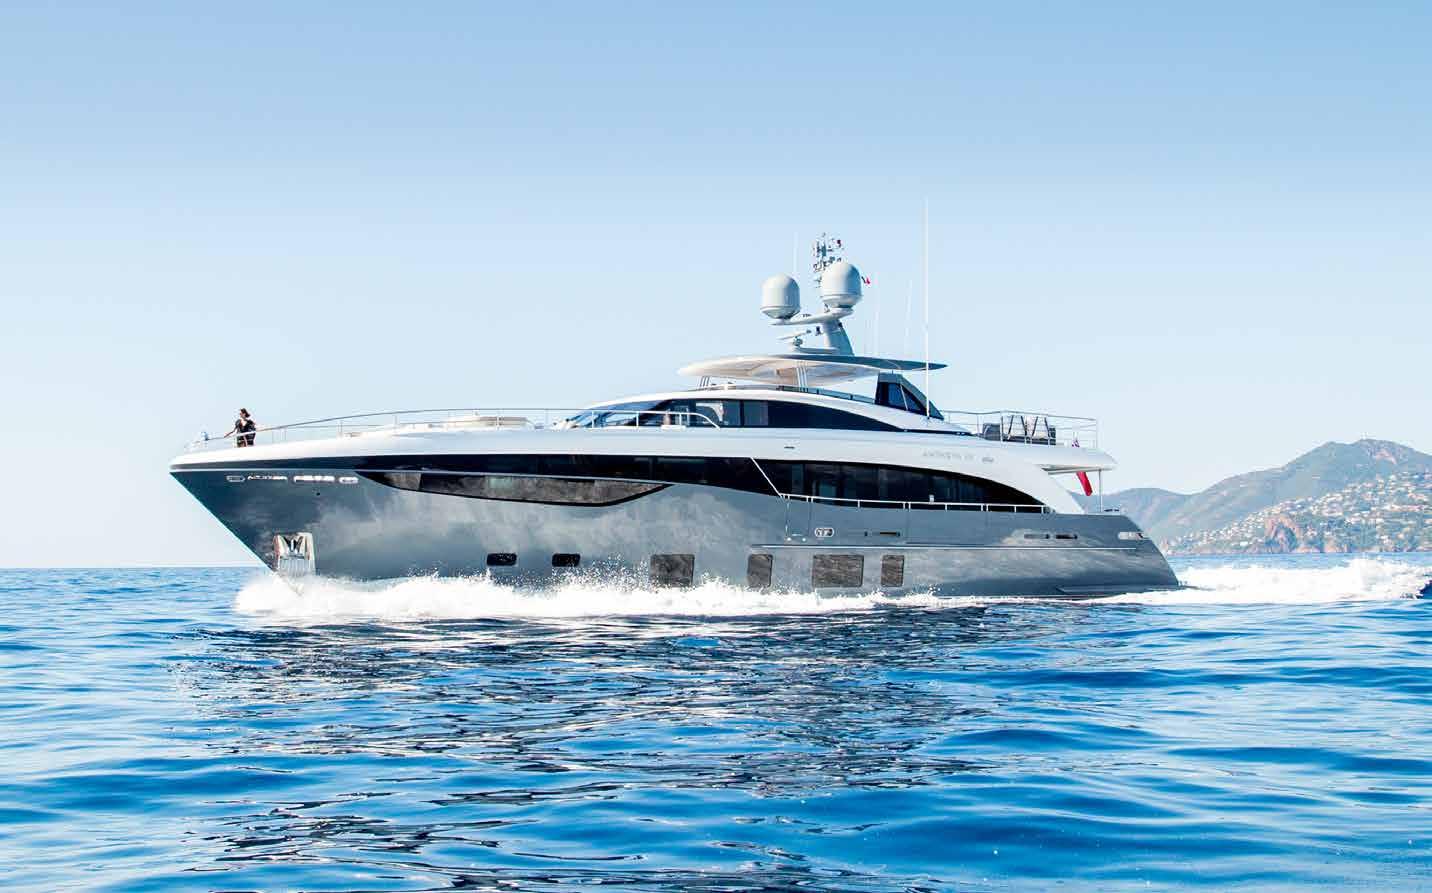 Супер яхта Princess 35 метров во Франции